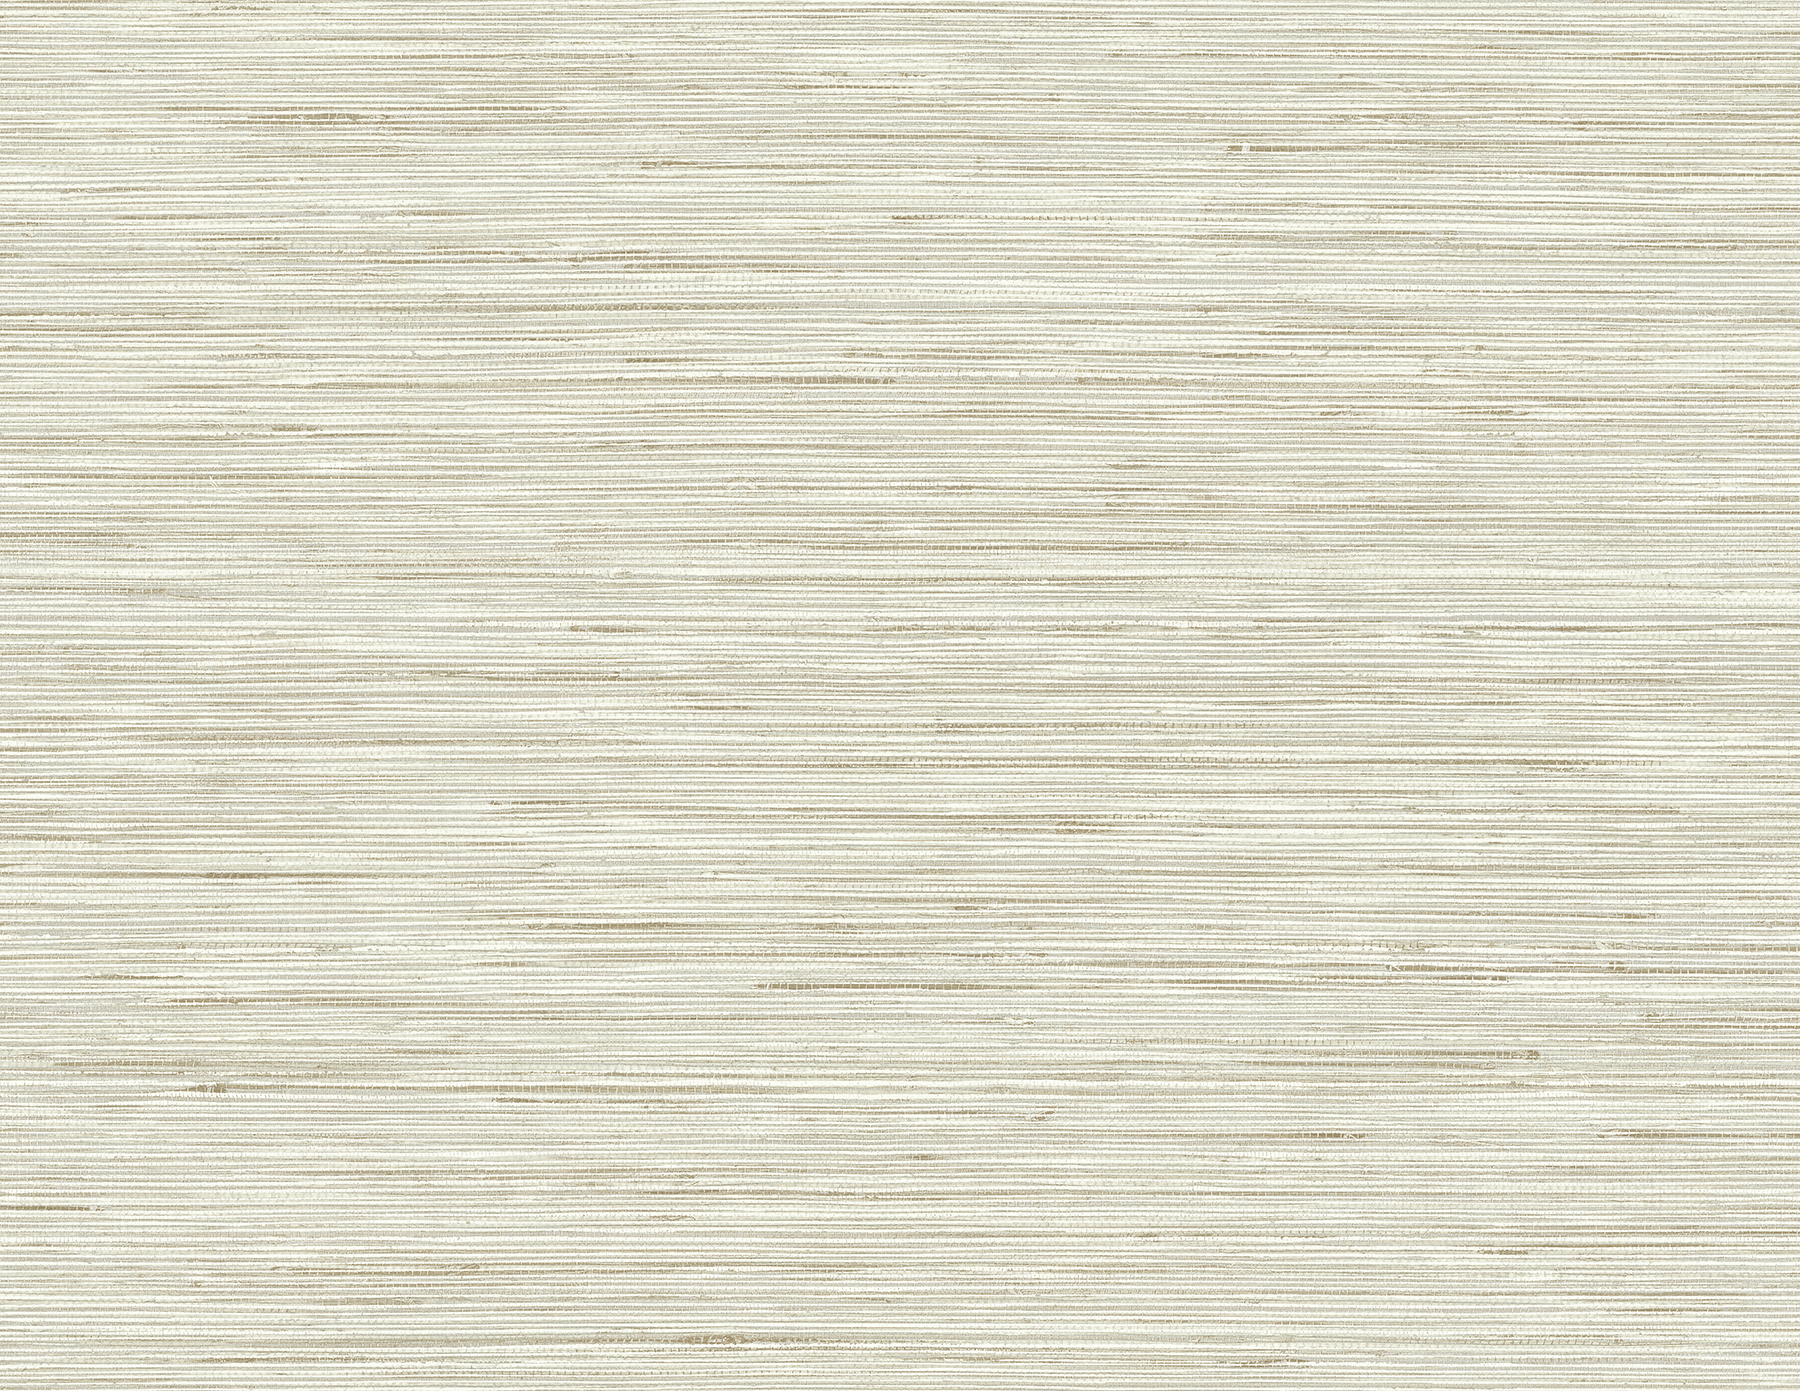 Picture of Baja Grass Grey Texture Wallpaper